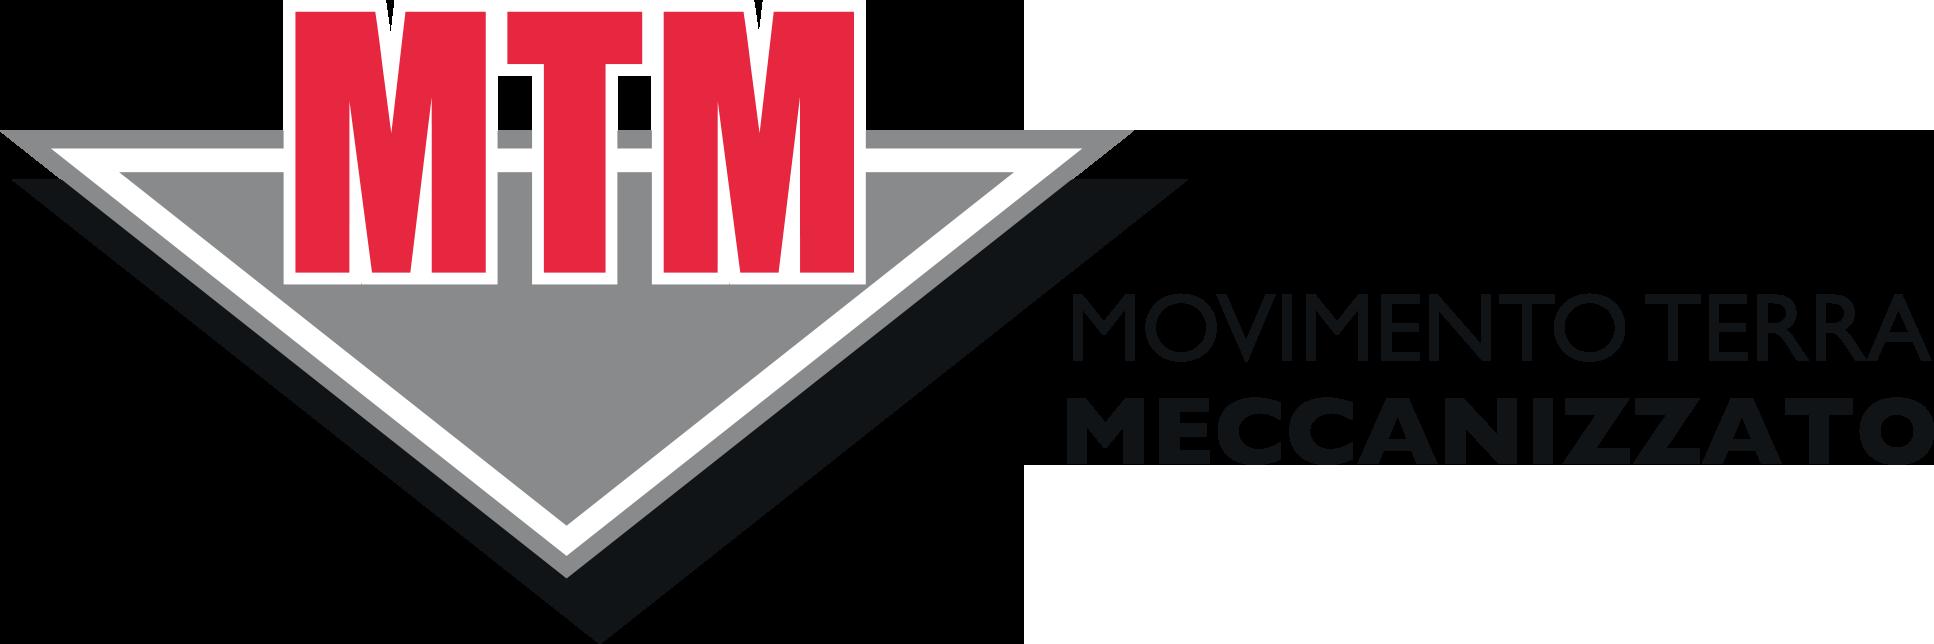 MTM Movimento Terra